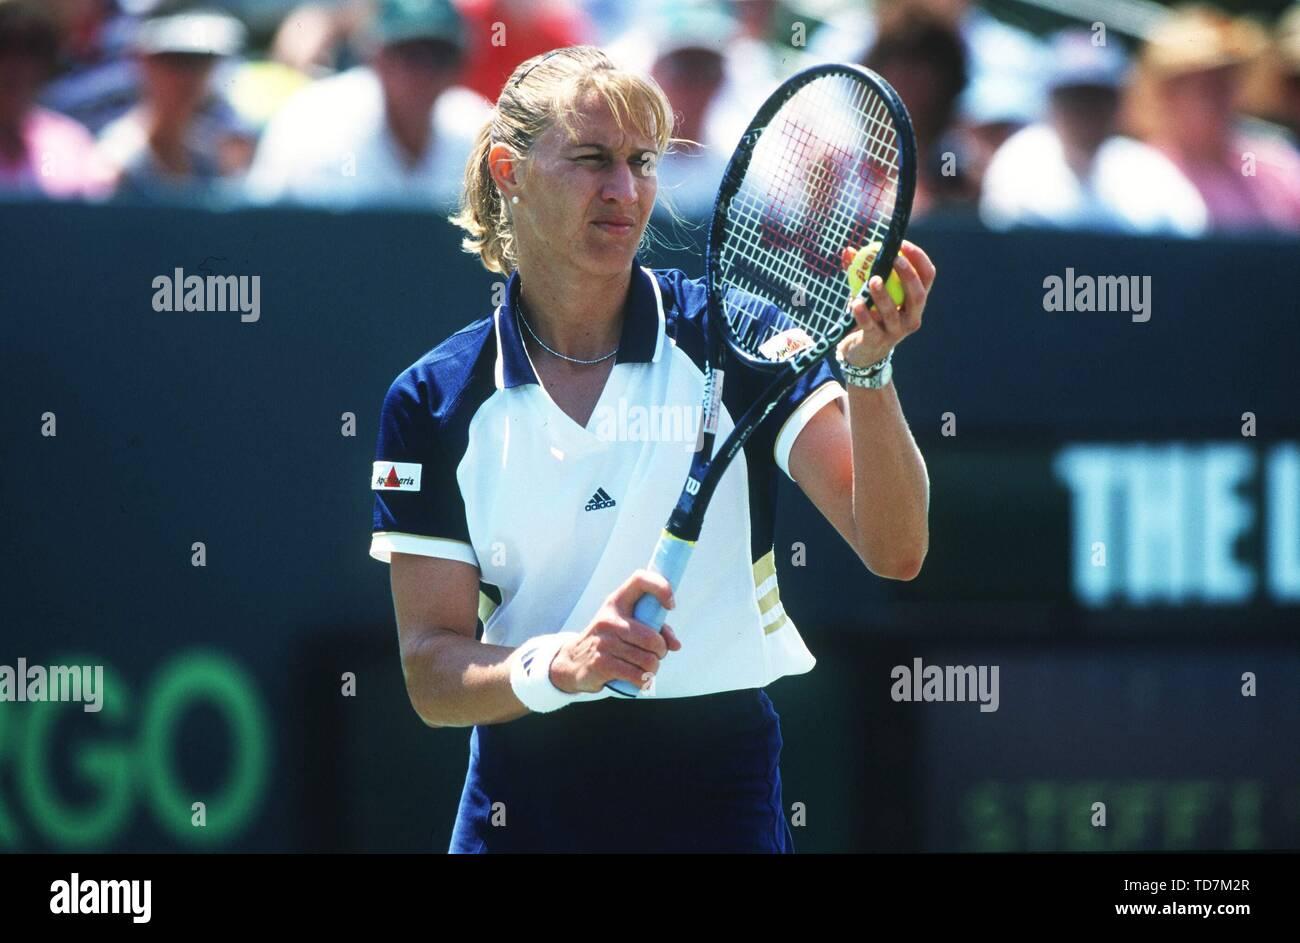 Paris, Frankreich. 10th Sep, 2015. Tennis: Paris French Open 05/1999 Steffi Stefanie Steffanie Graf Final Promotion Service | usage worldwide Credit: dpa/Alamy Live News - Stock Image